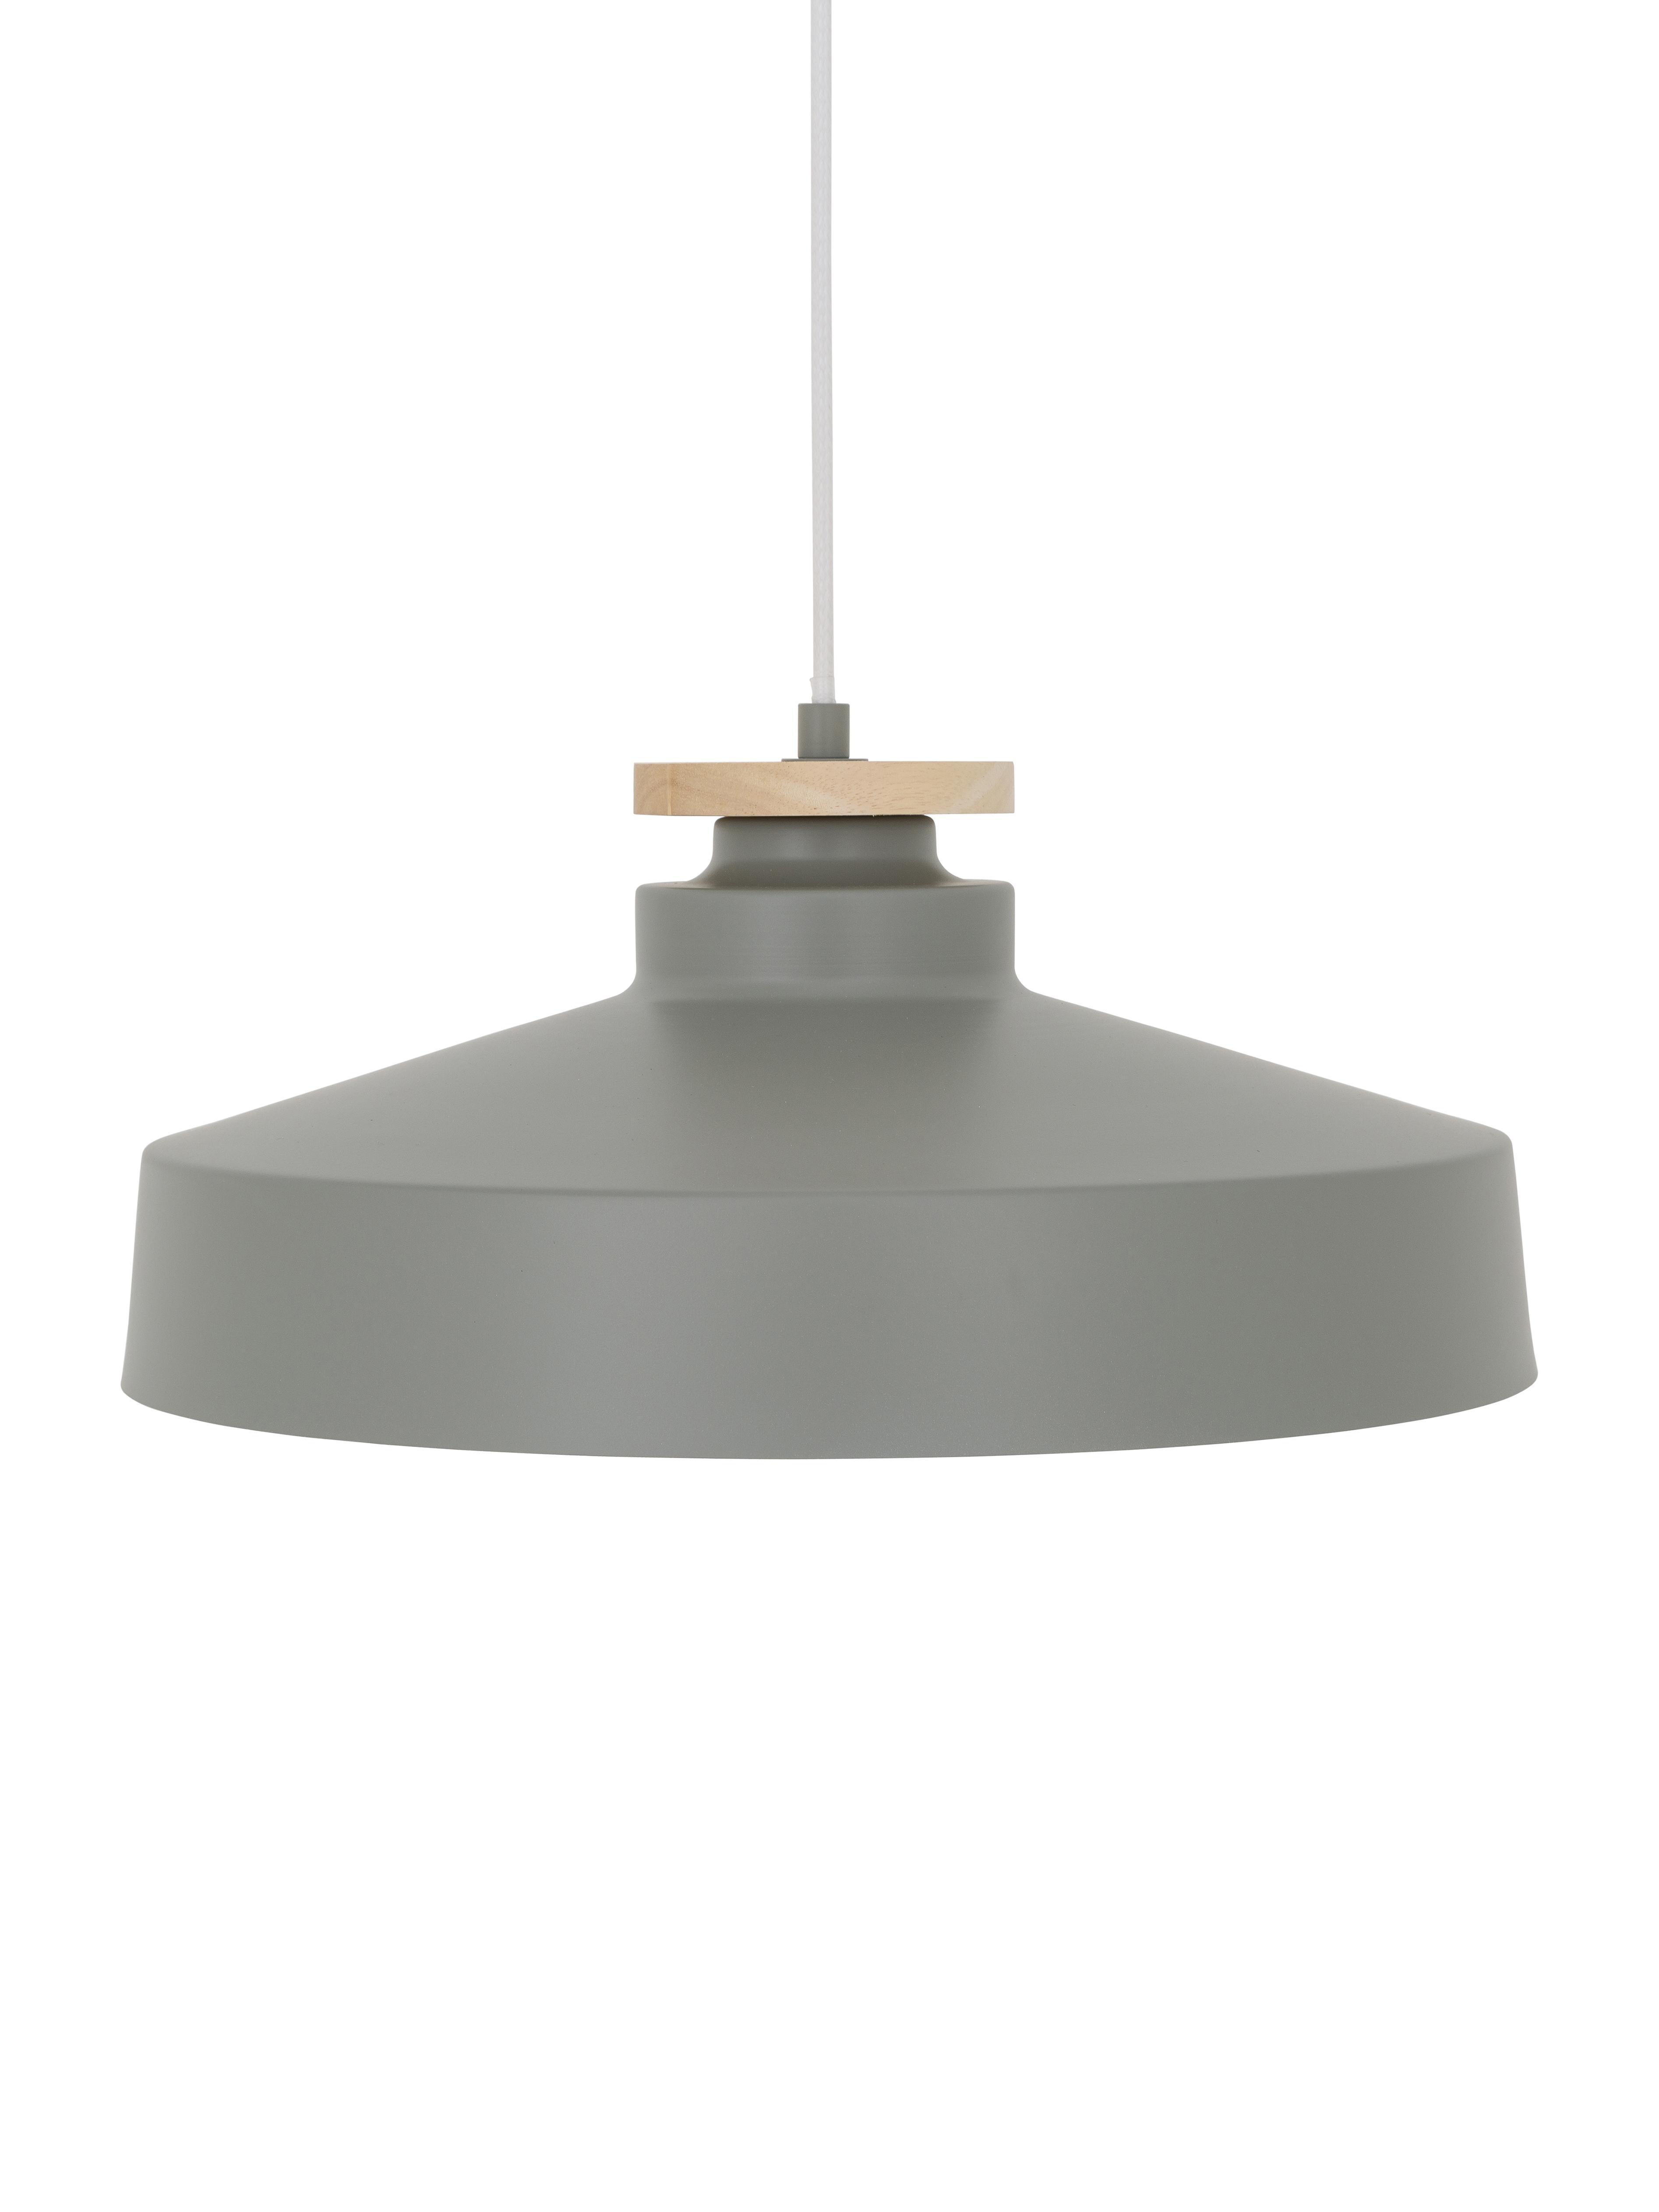 Skandi-Pendelleuchte Malm, Lampenschirm: Metall, Holz, Baldachin: Metall, Grau, Ø 40 x H 20 cm